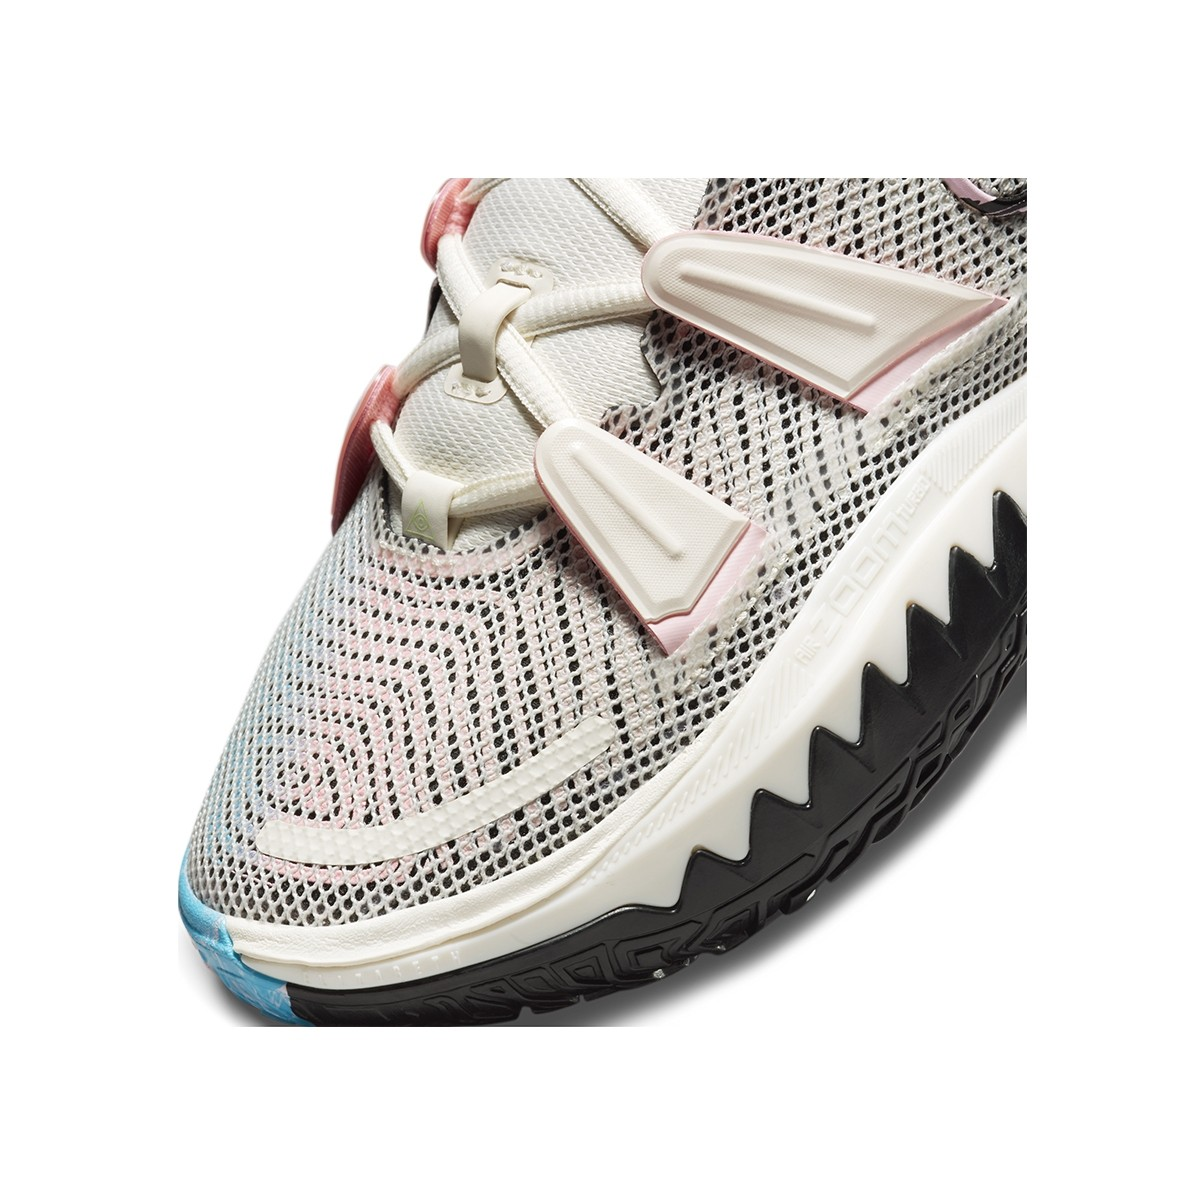 Nike Kyrie 7 'Pale Ivory'-CZ0141-100